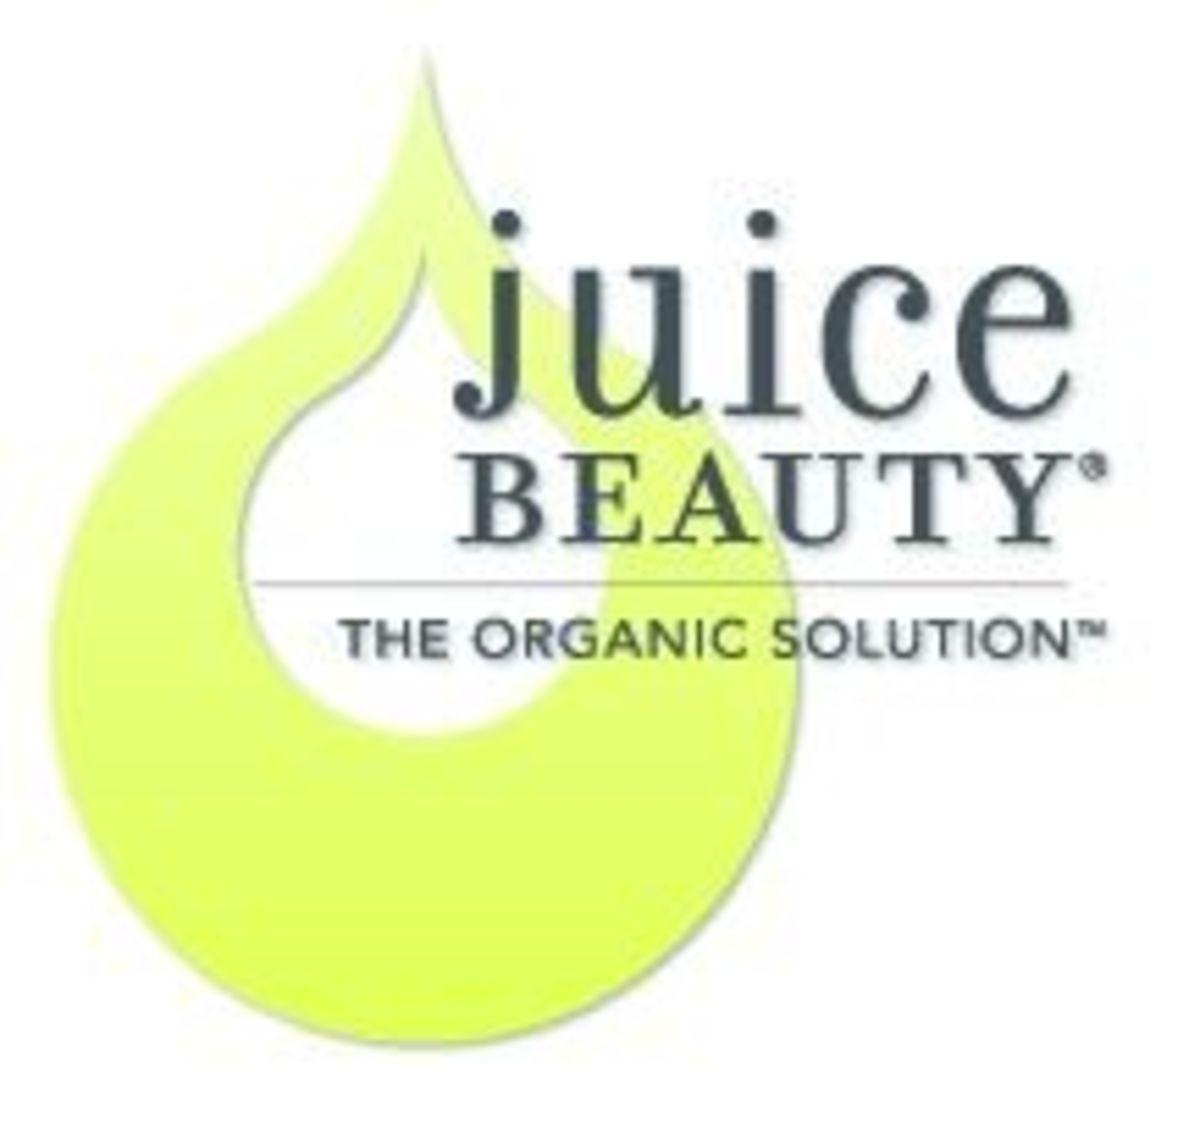 juicelogo-juicebeauty-juicebeauty